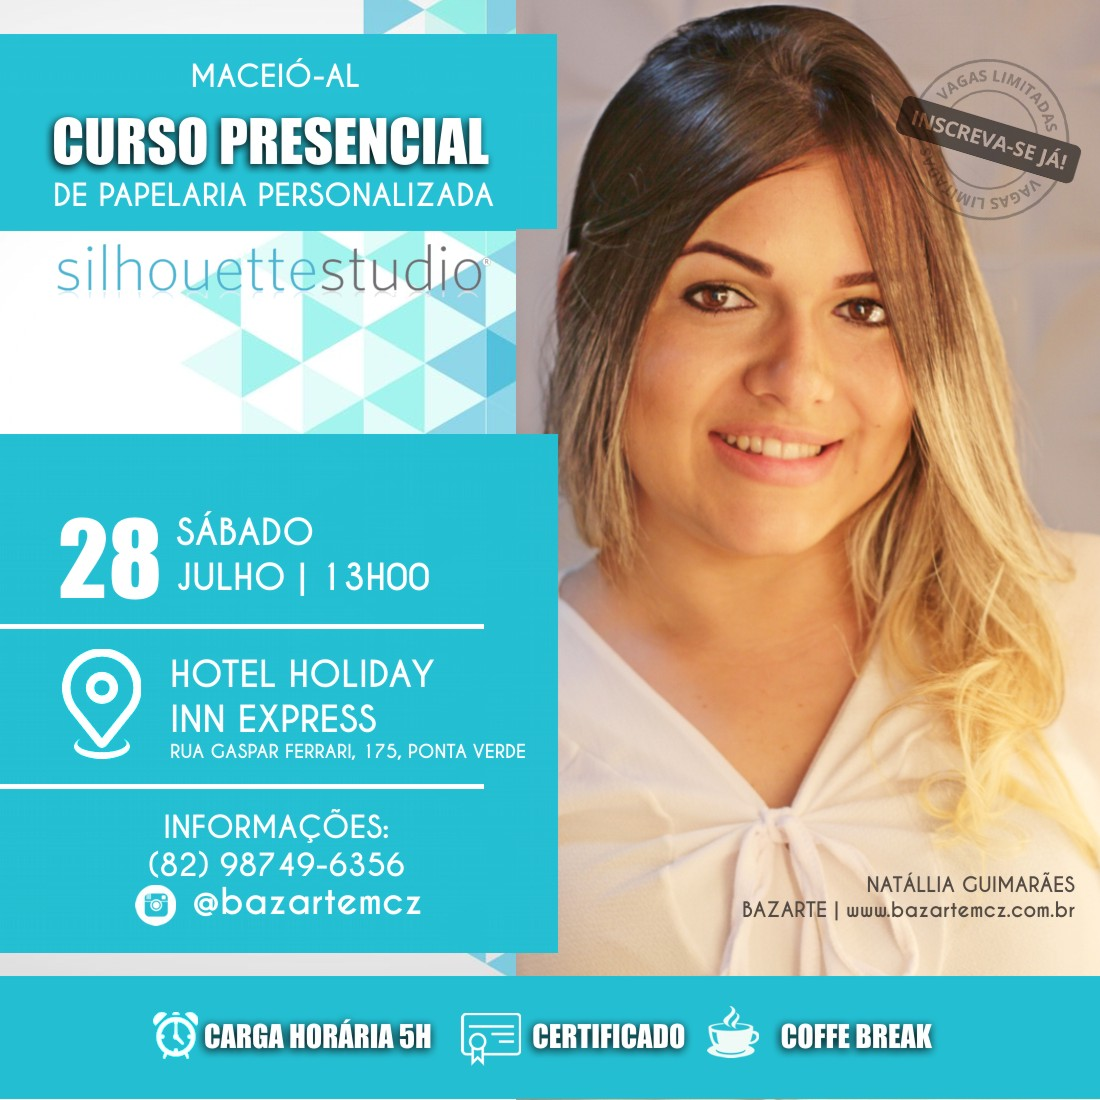 CURSO PAPELARIA PERSONALIZADA/SILHOUETTE